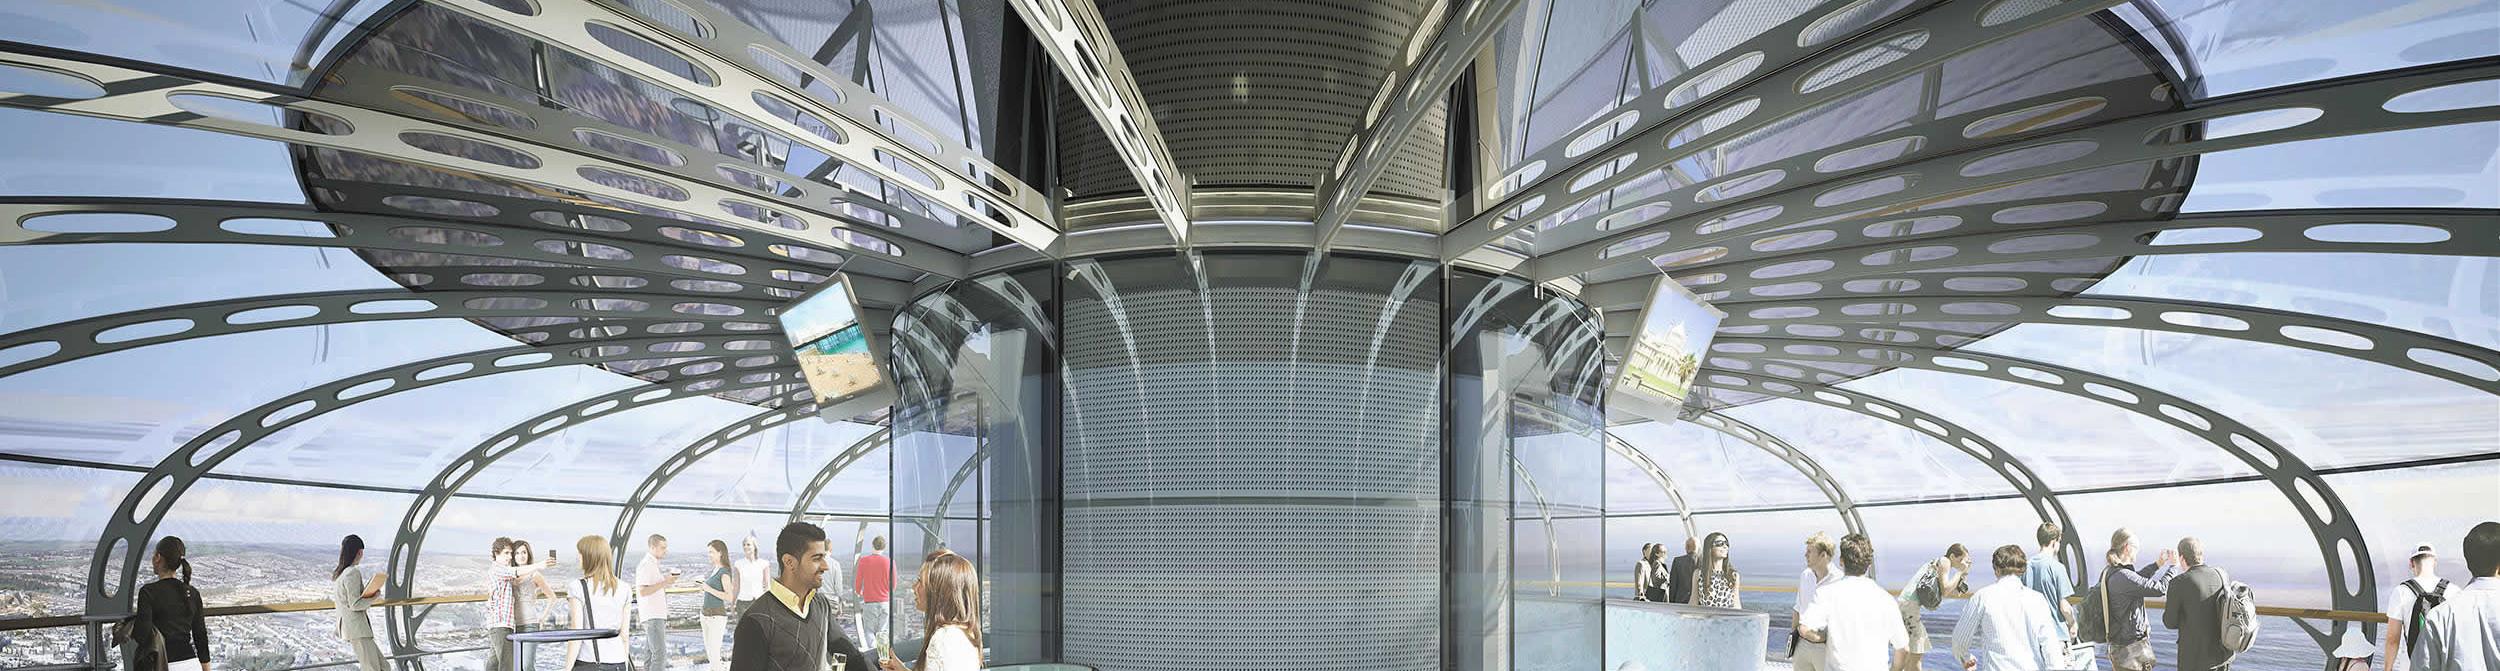 Architectural Visualisation i360 pod